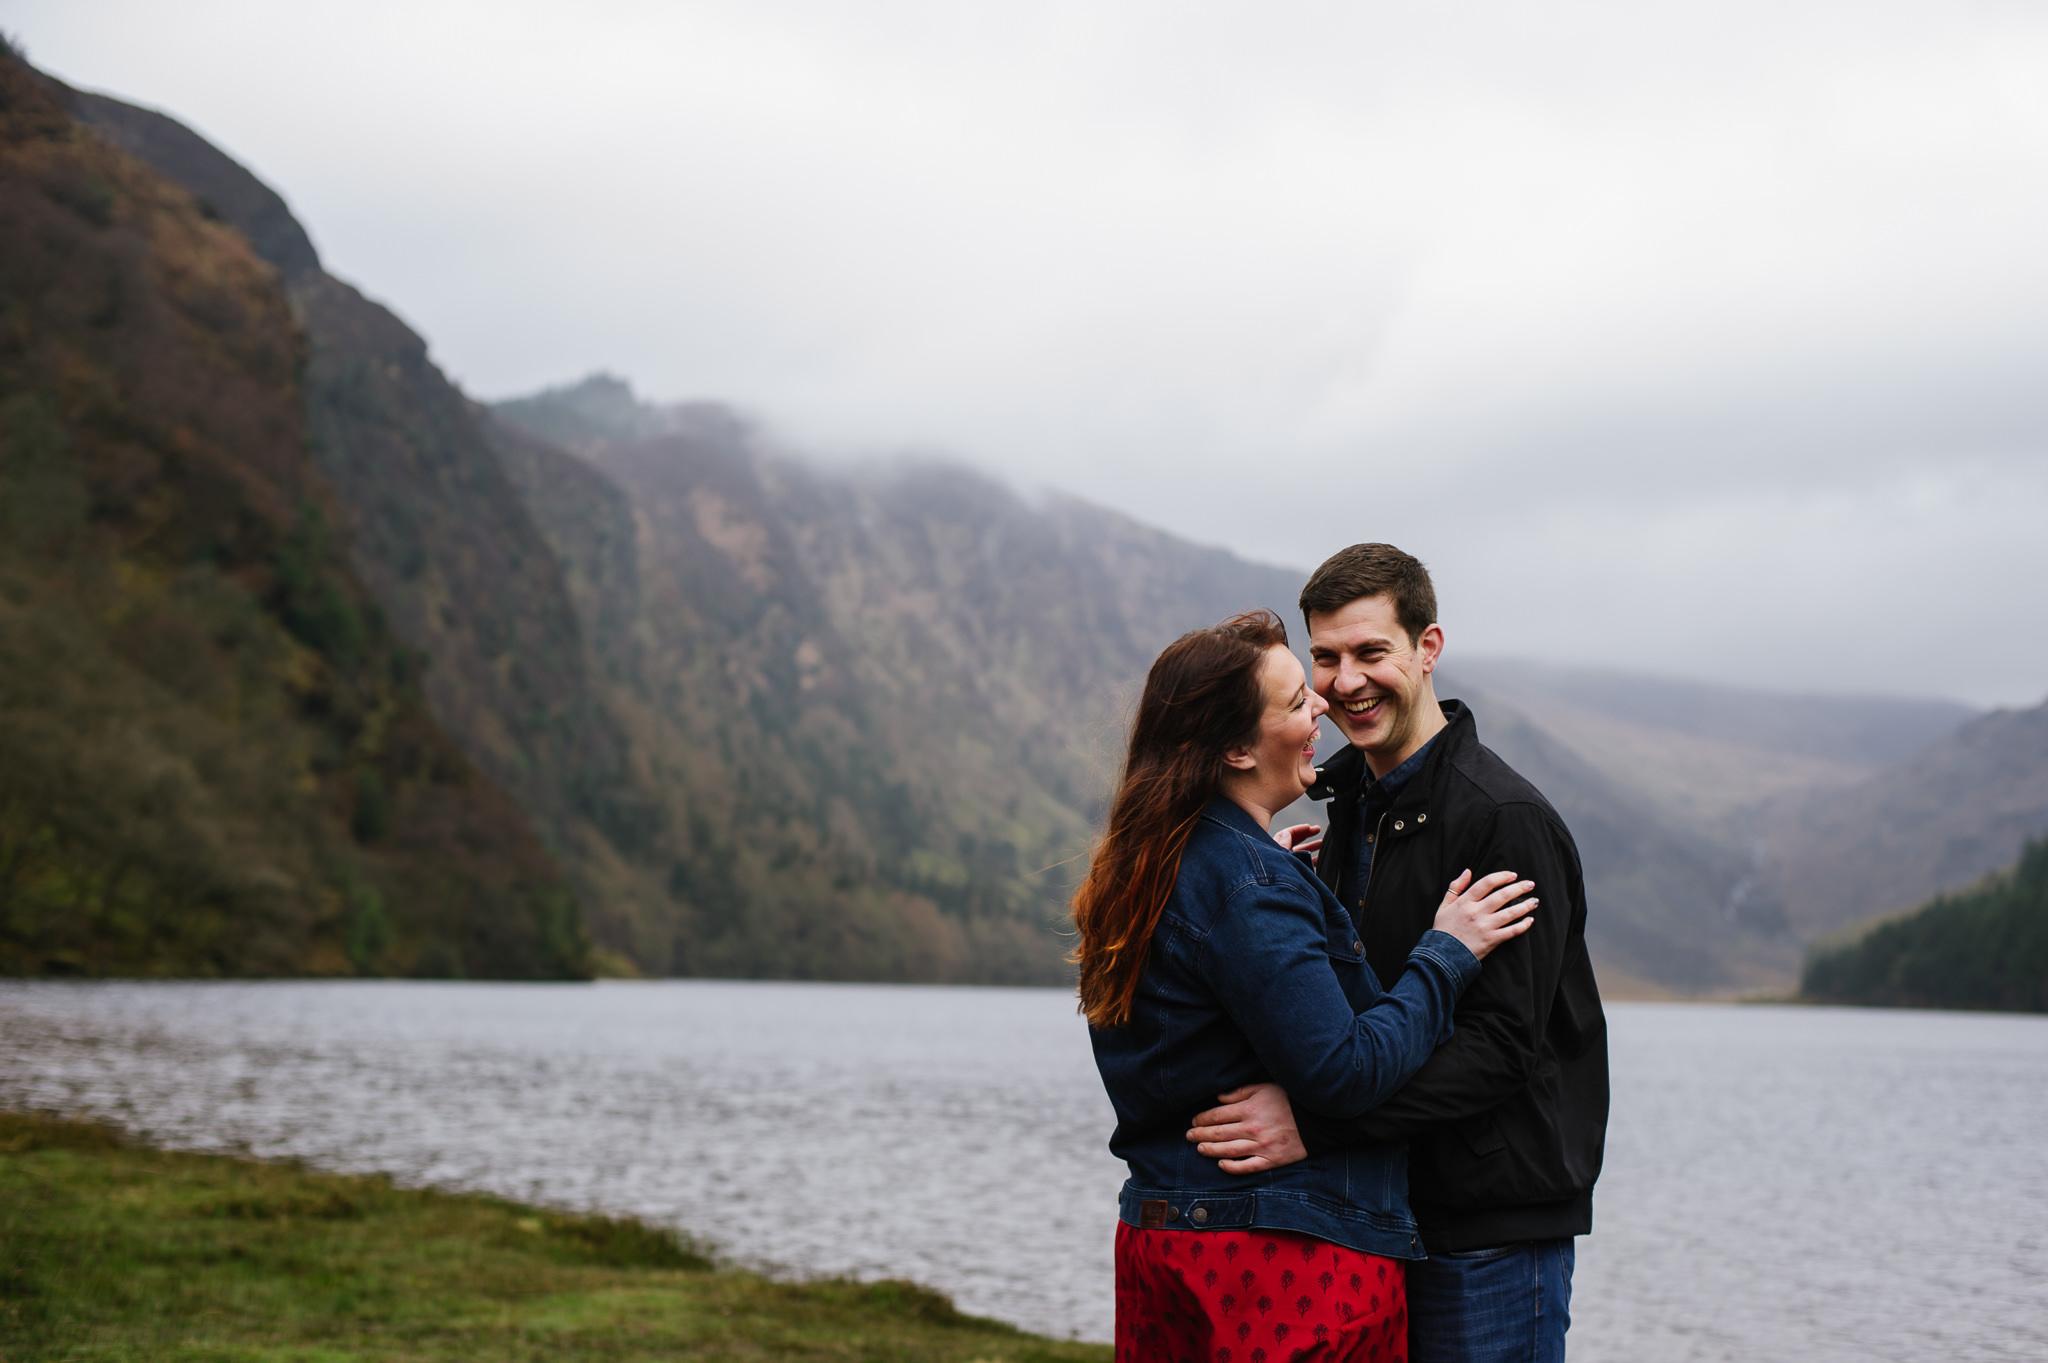 GlendaloughEngagementPhotographyIreland-5.jpg